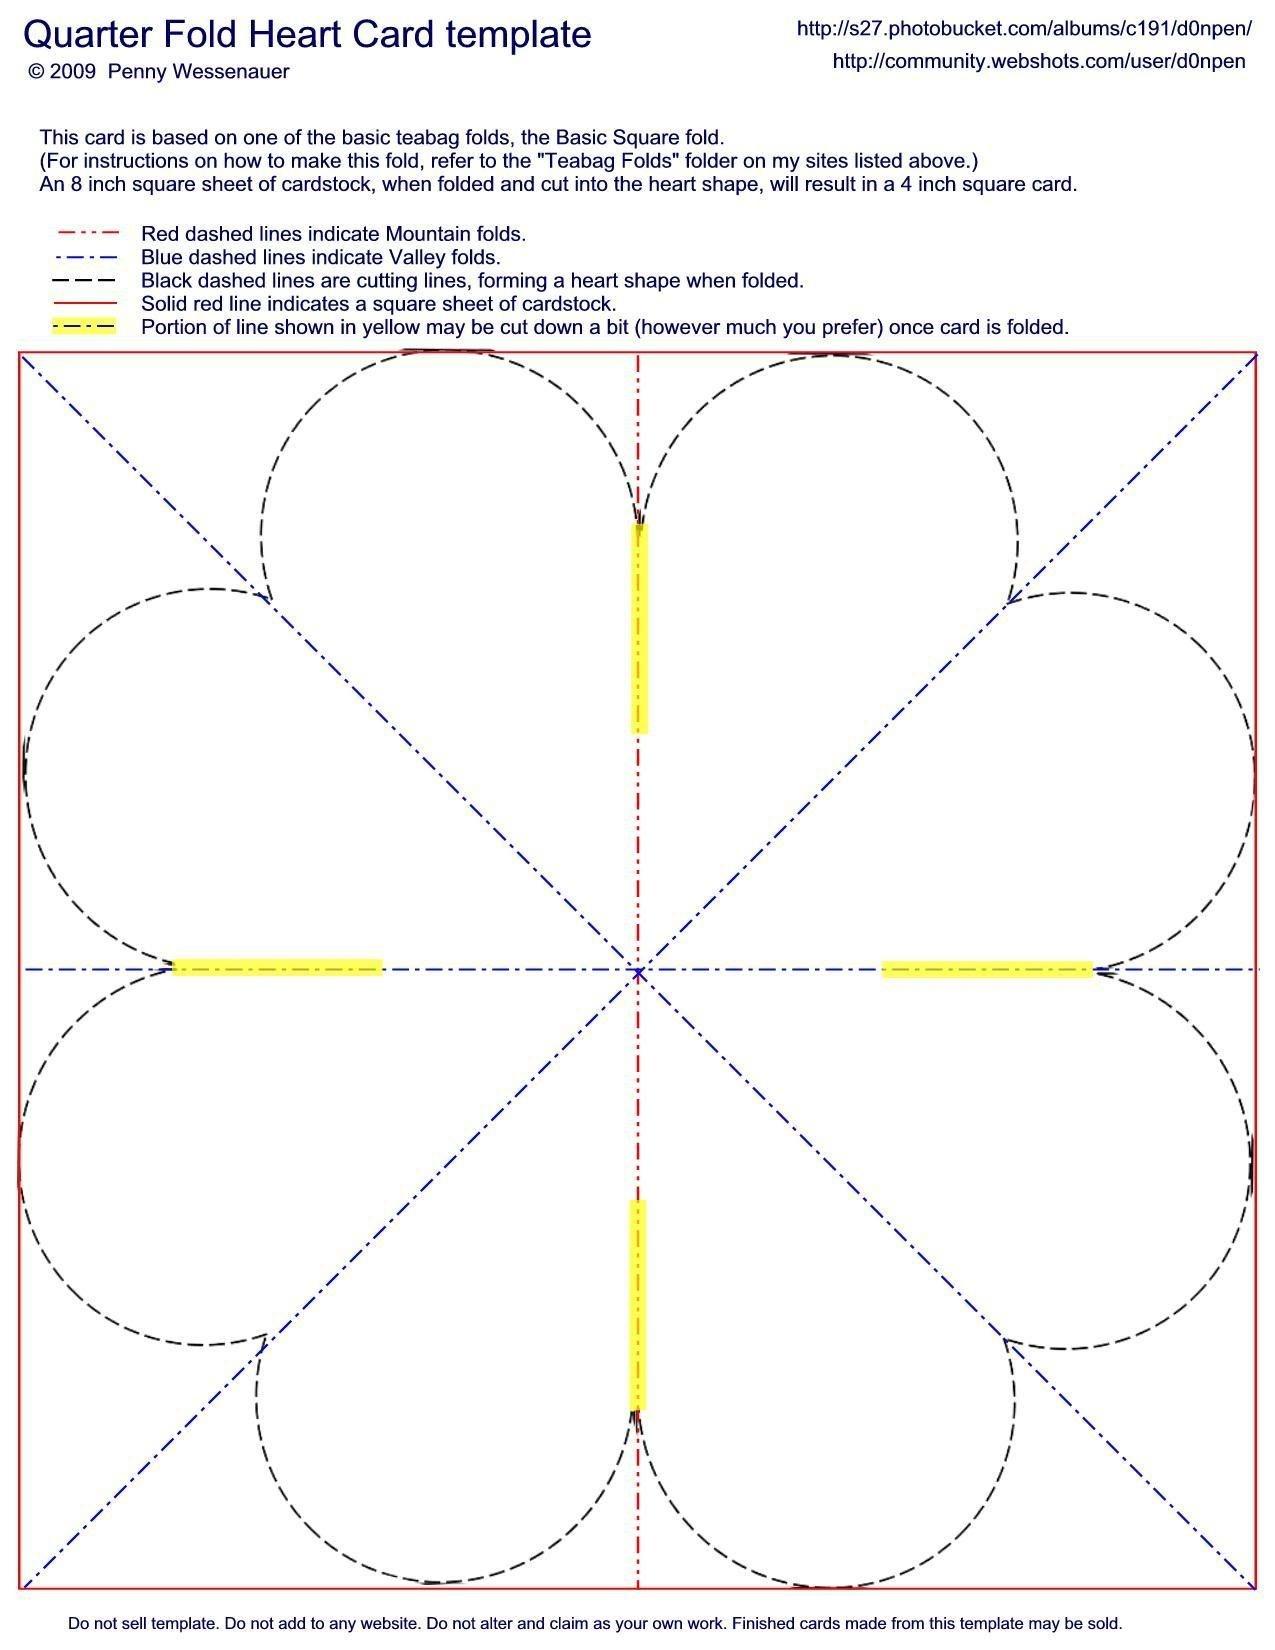 Quarter-Fold Heart Card Template | Fancy Folds | Card Making - Free Printable Quarter Fold Christmas Cards